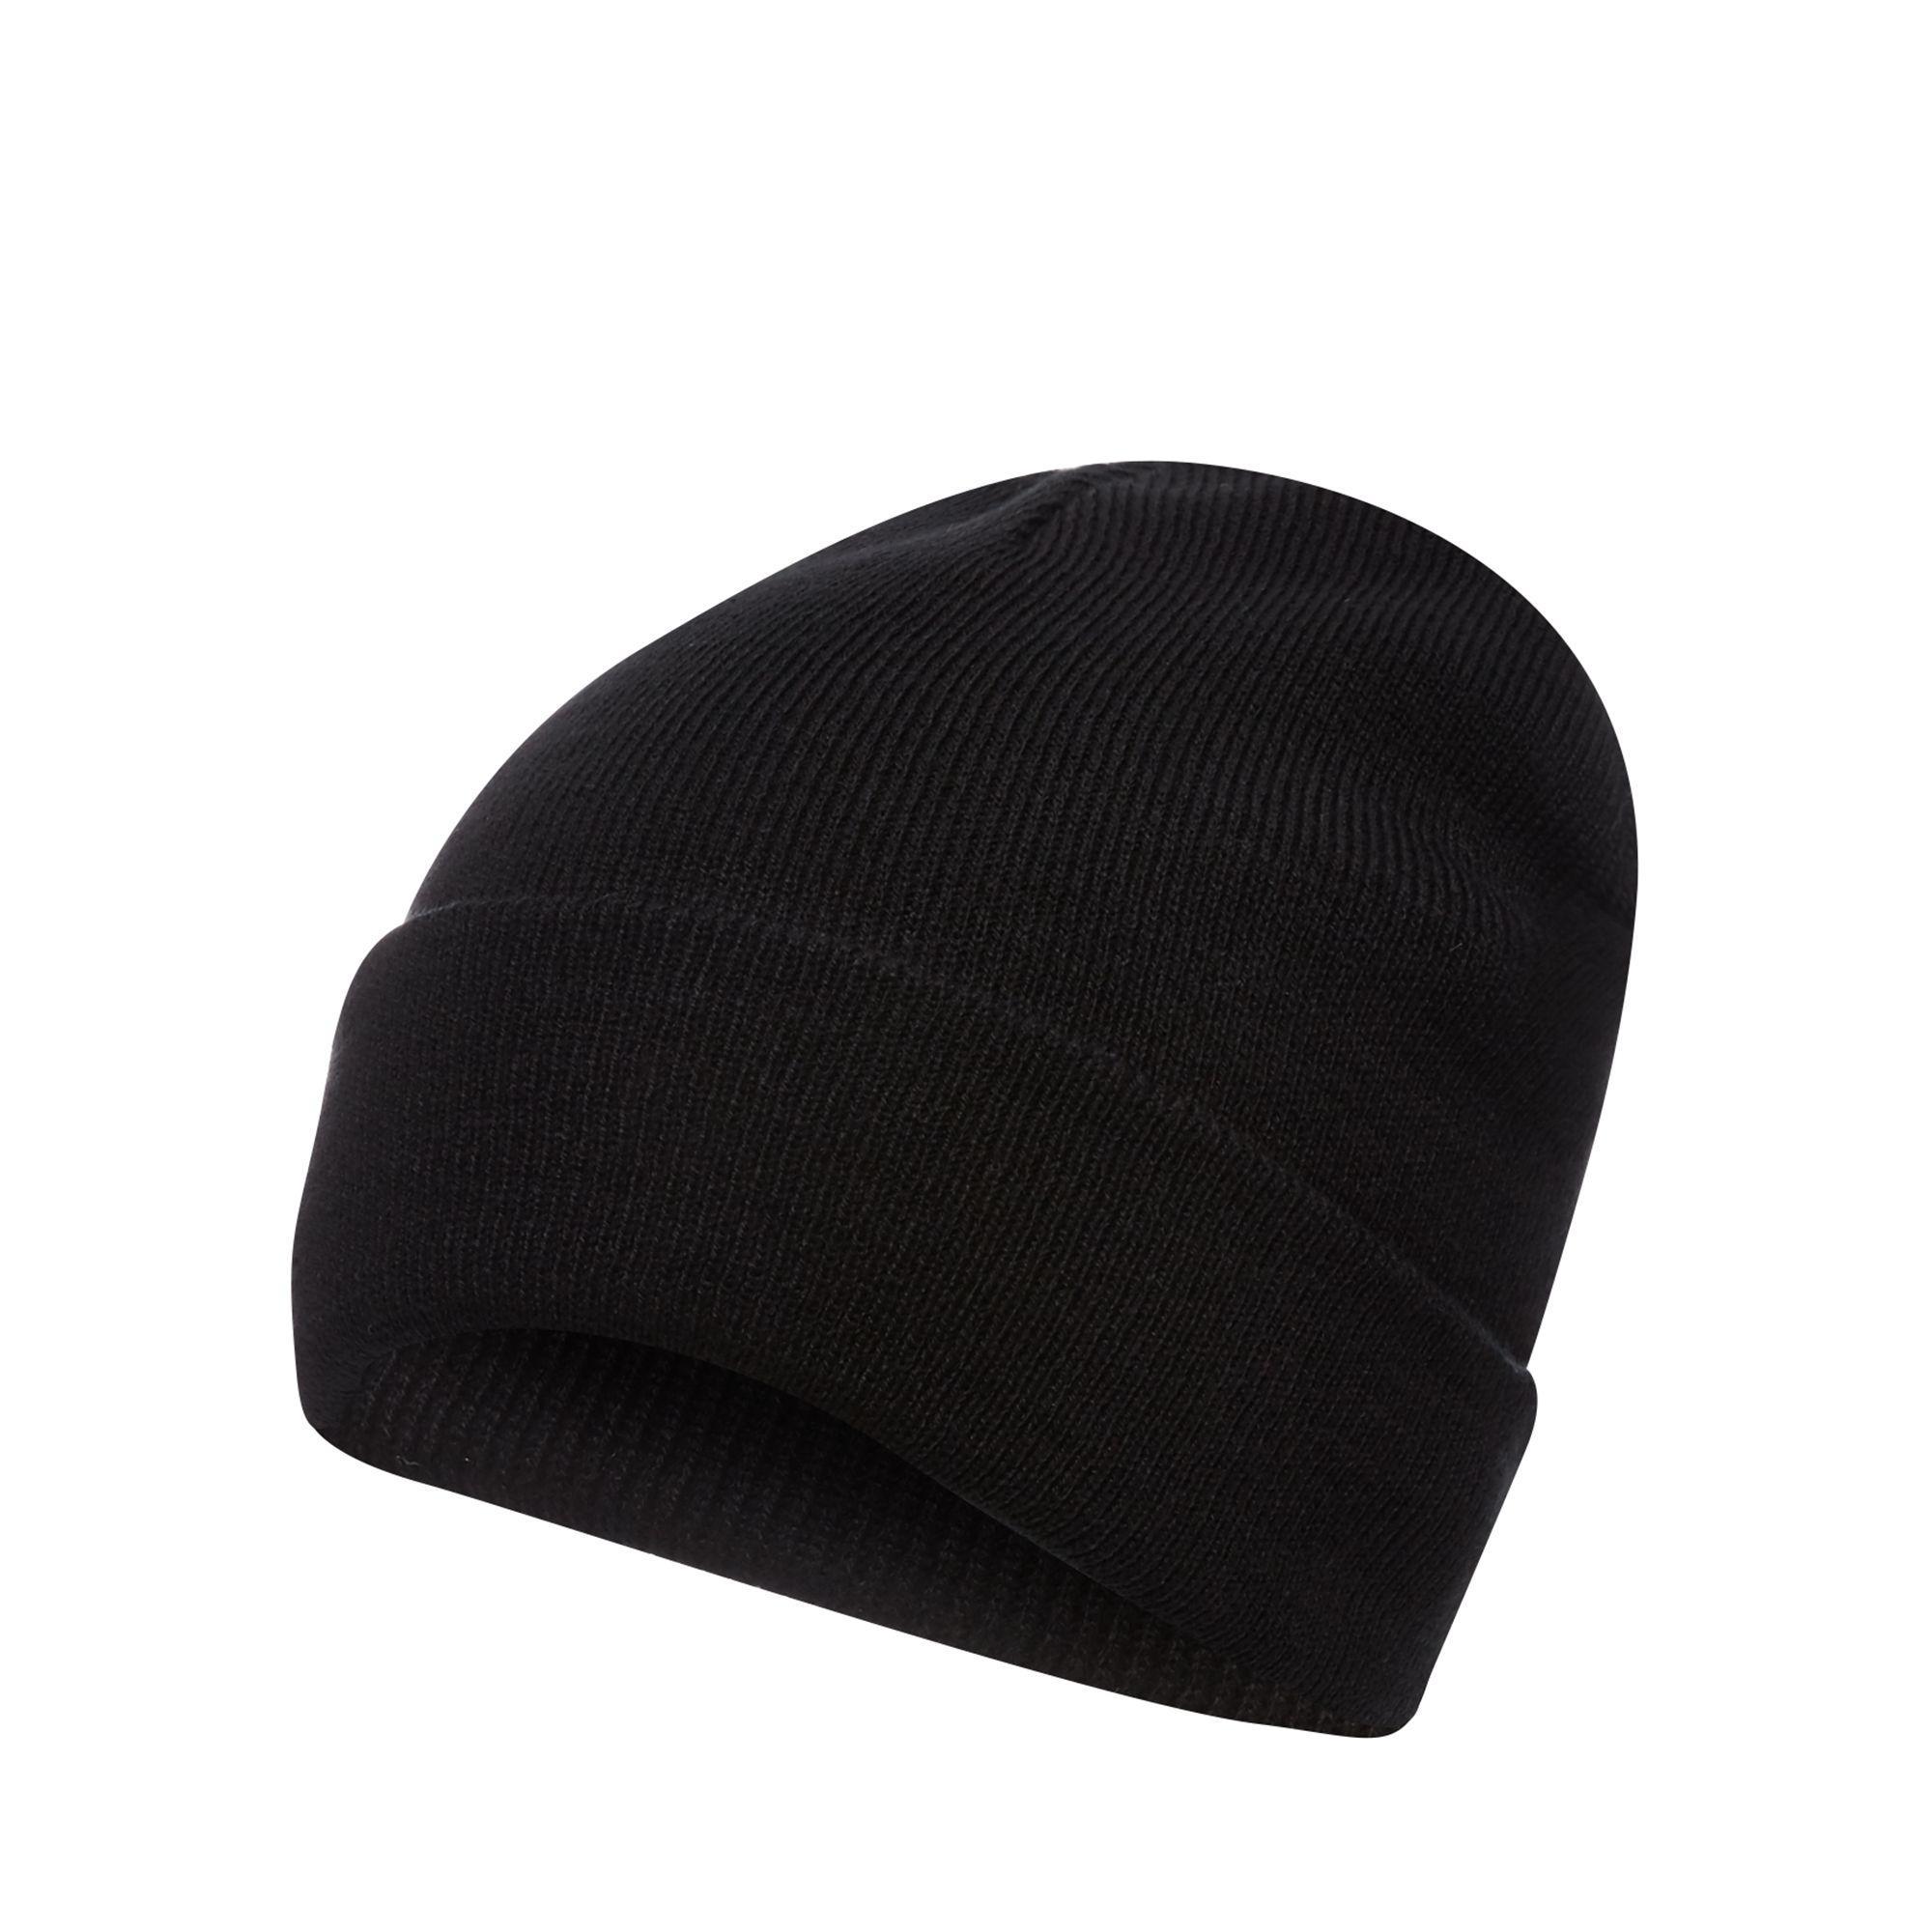 9ad18634b59eb Red Herring Black Plain Beanie Hat in Black for Men - Lyst